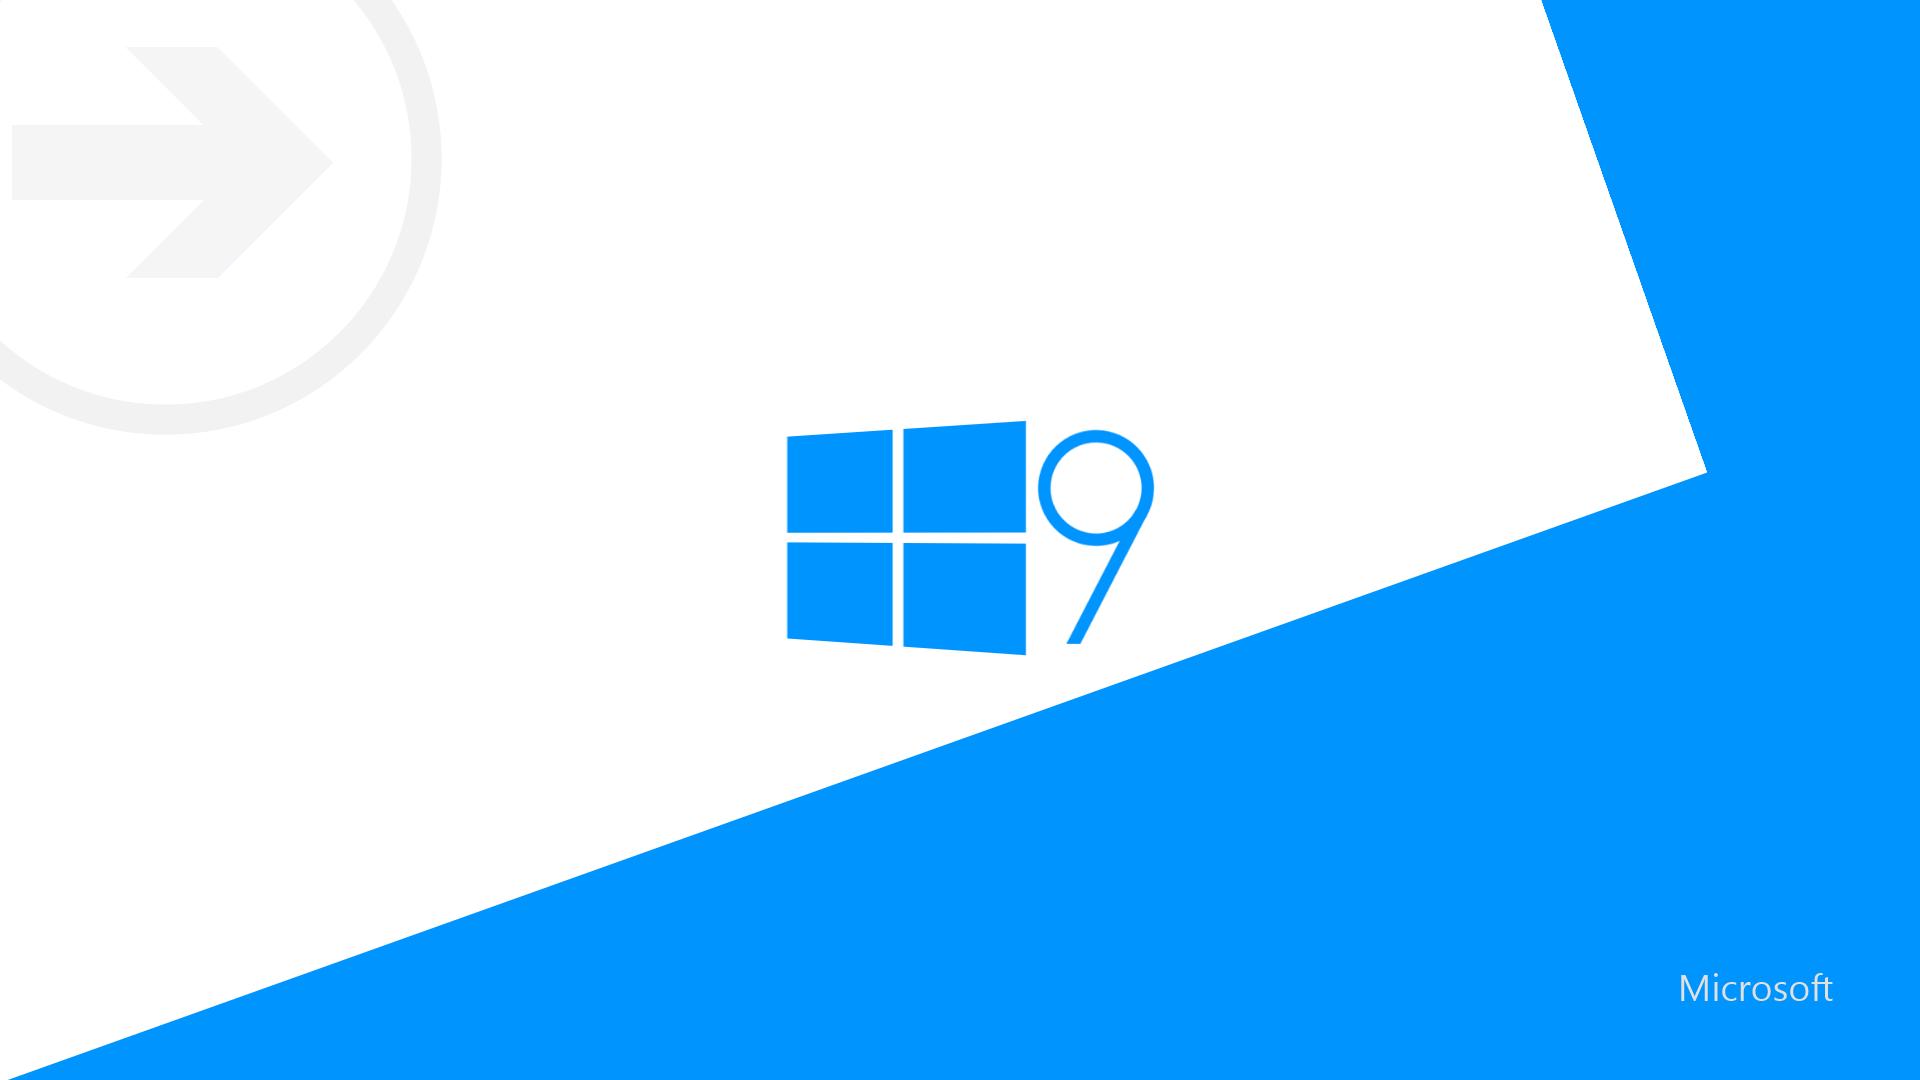 Microsoft releases windows 8 developer preview, announces windows.